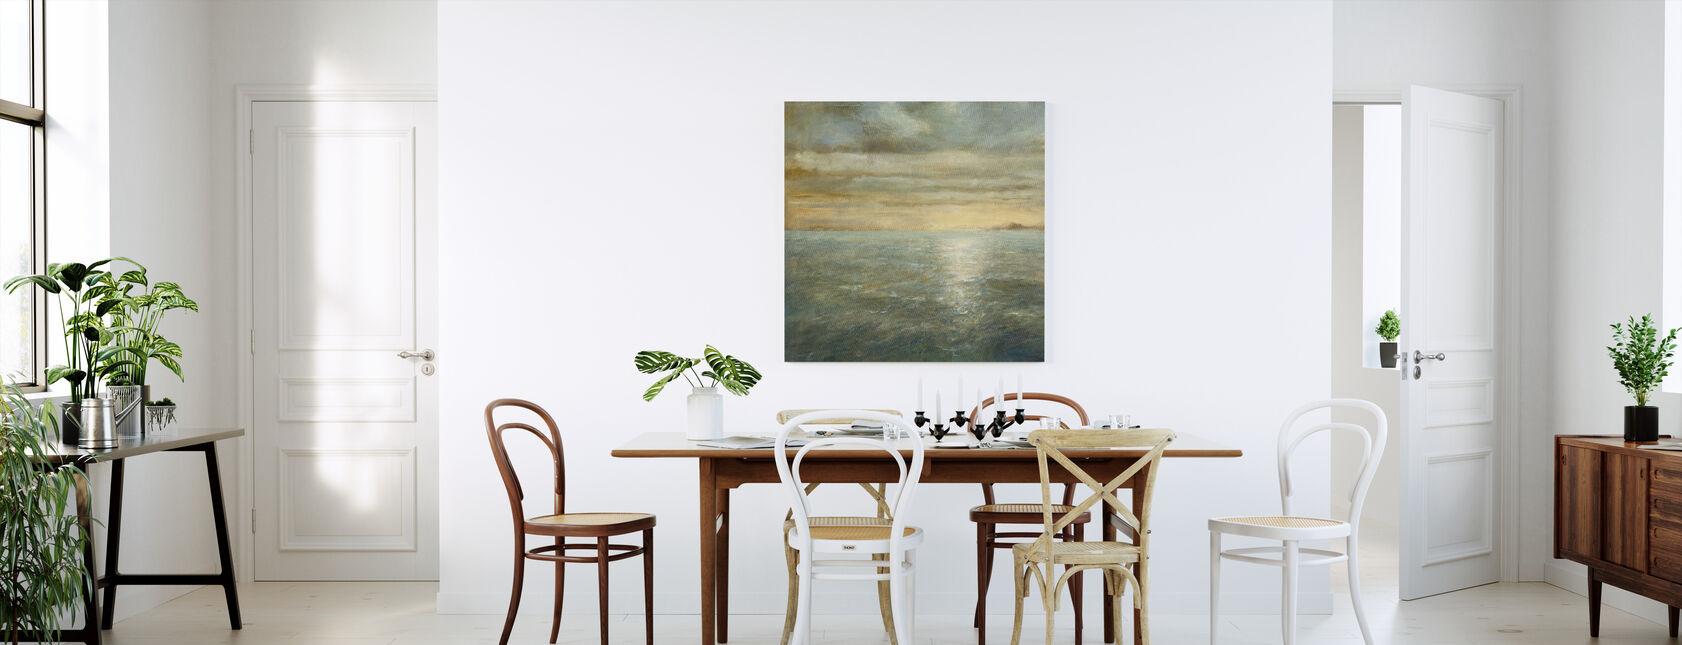 Serene Havet - Canvastavla - Kök